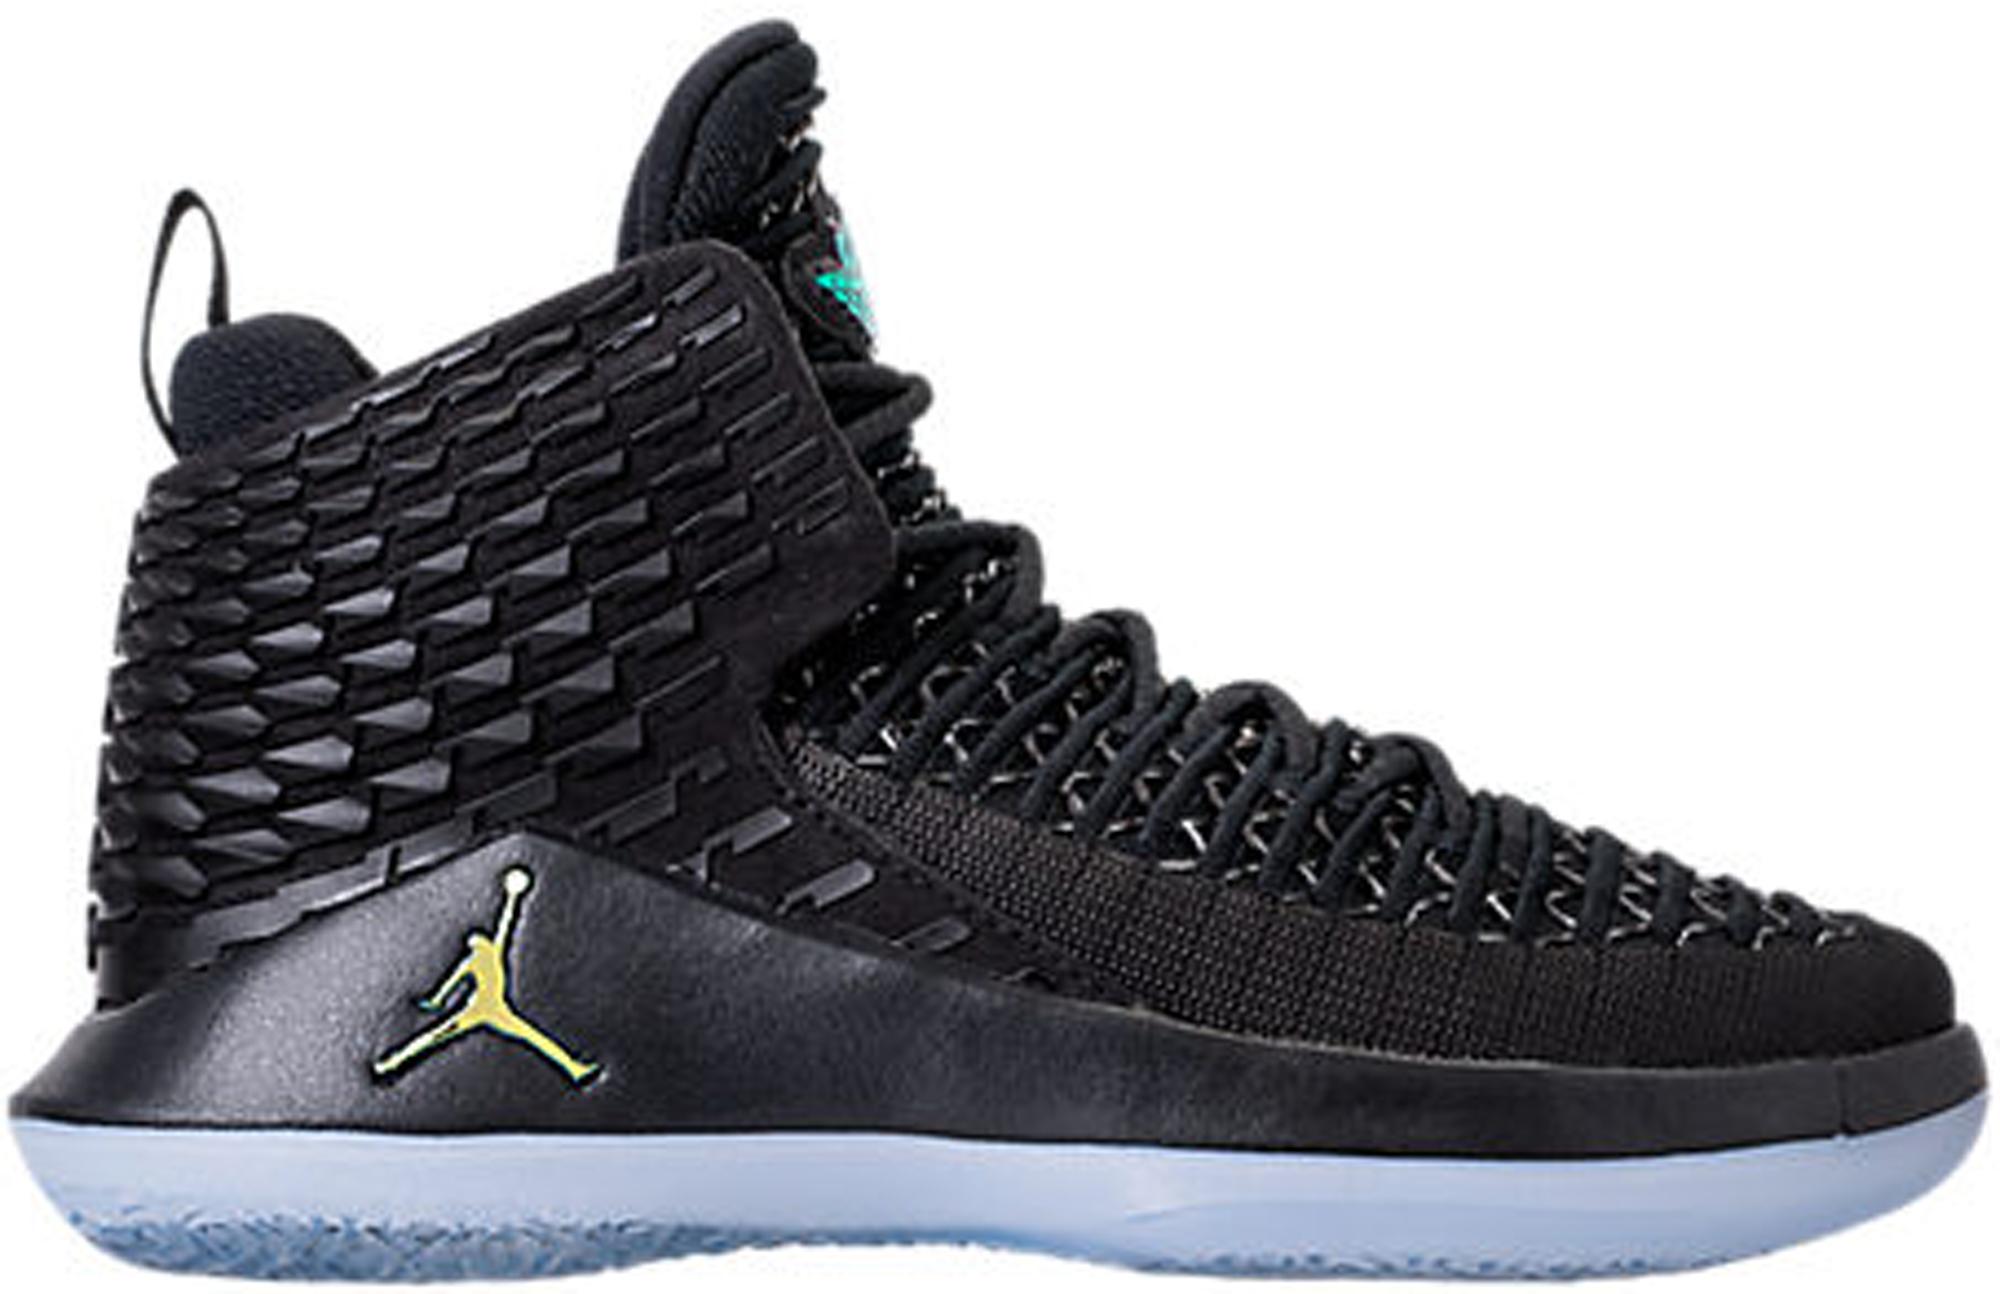 Air Jordan XXXII Black Cat (GS)